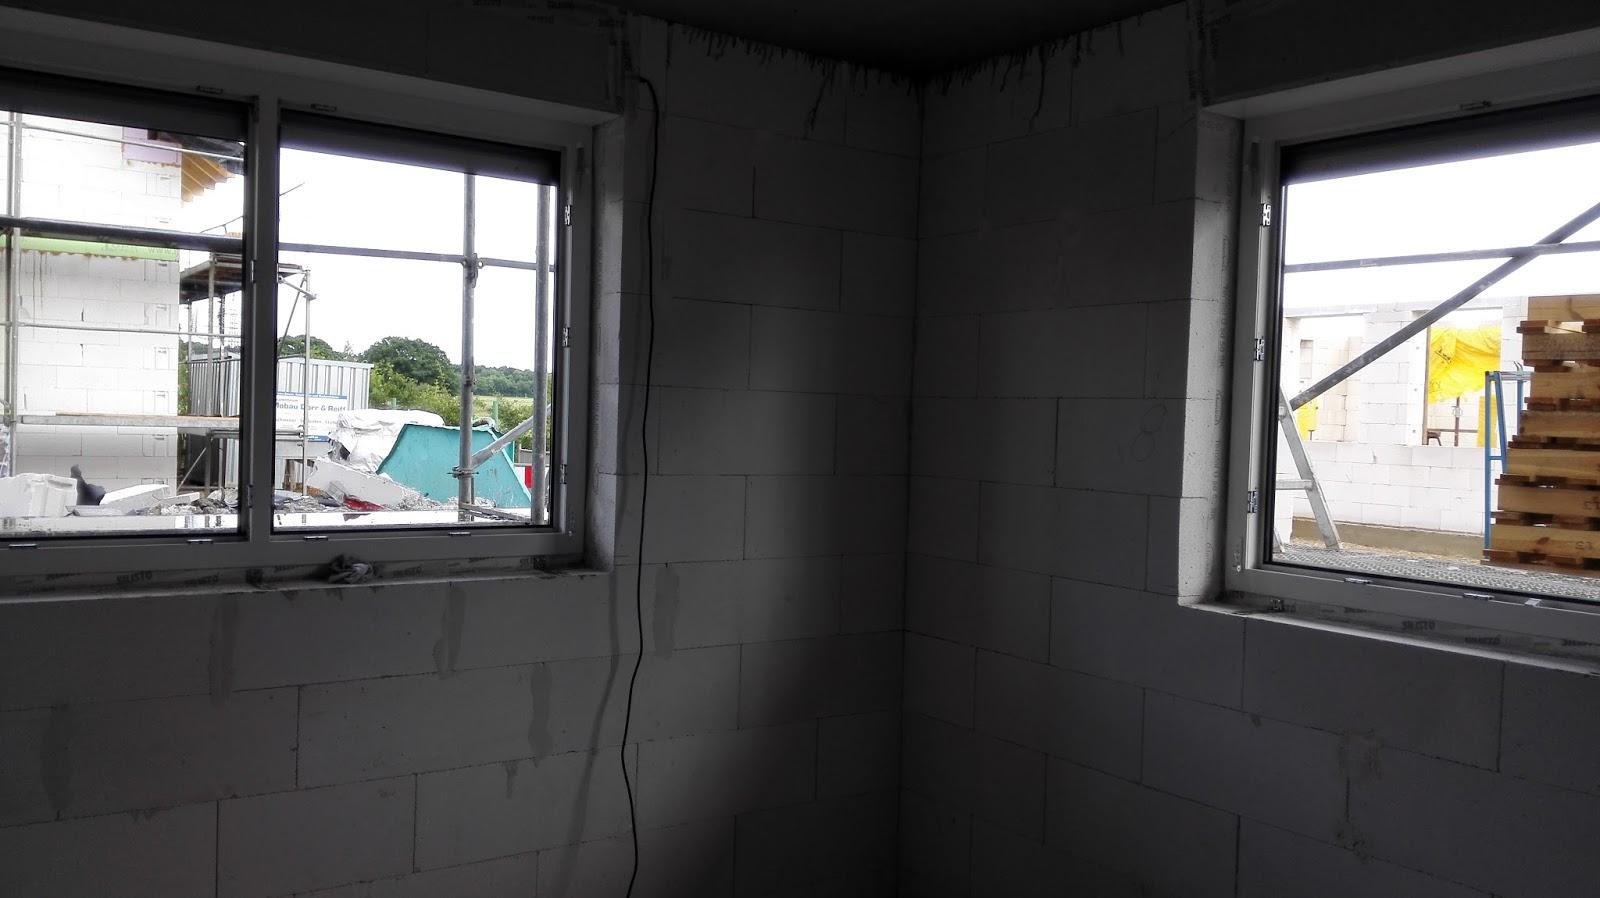 hd wallpapers badezimmer 4life bwallpapersmobileae.gq, Badezimmer ideen